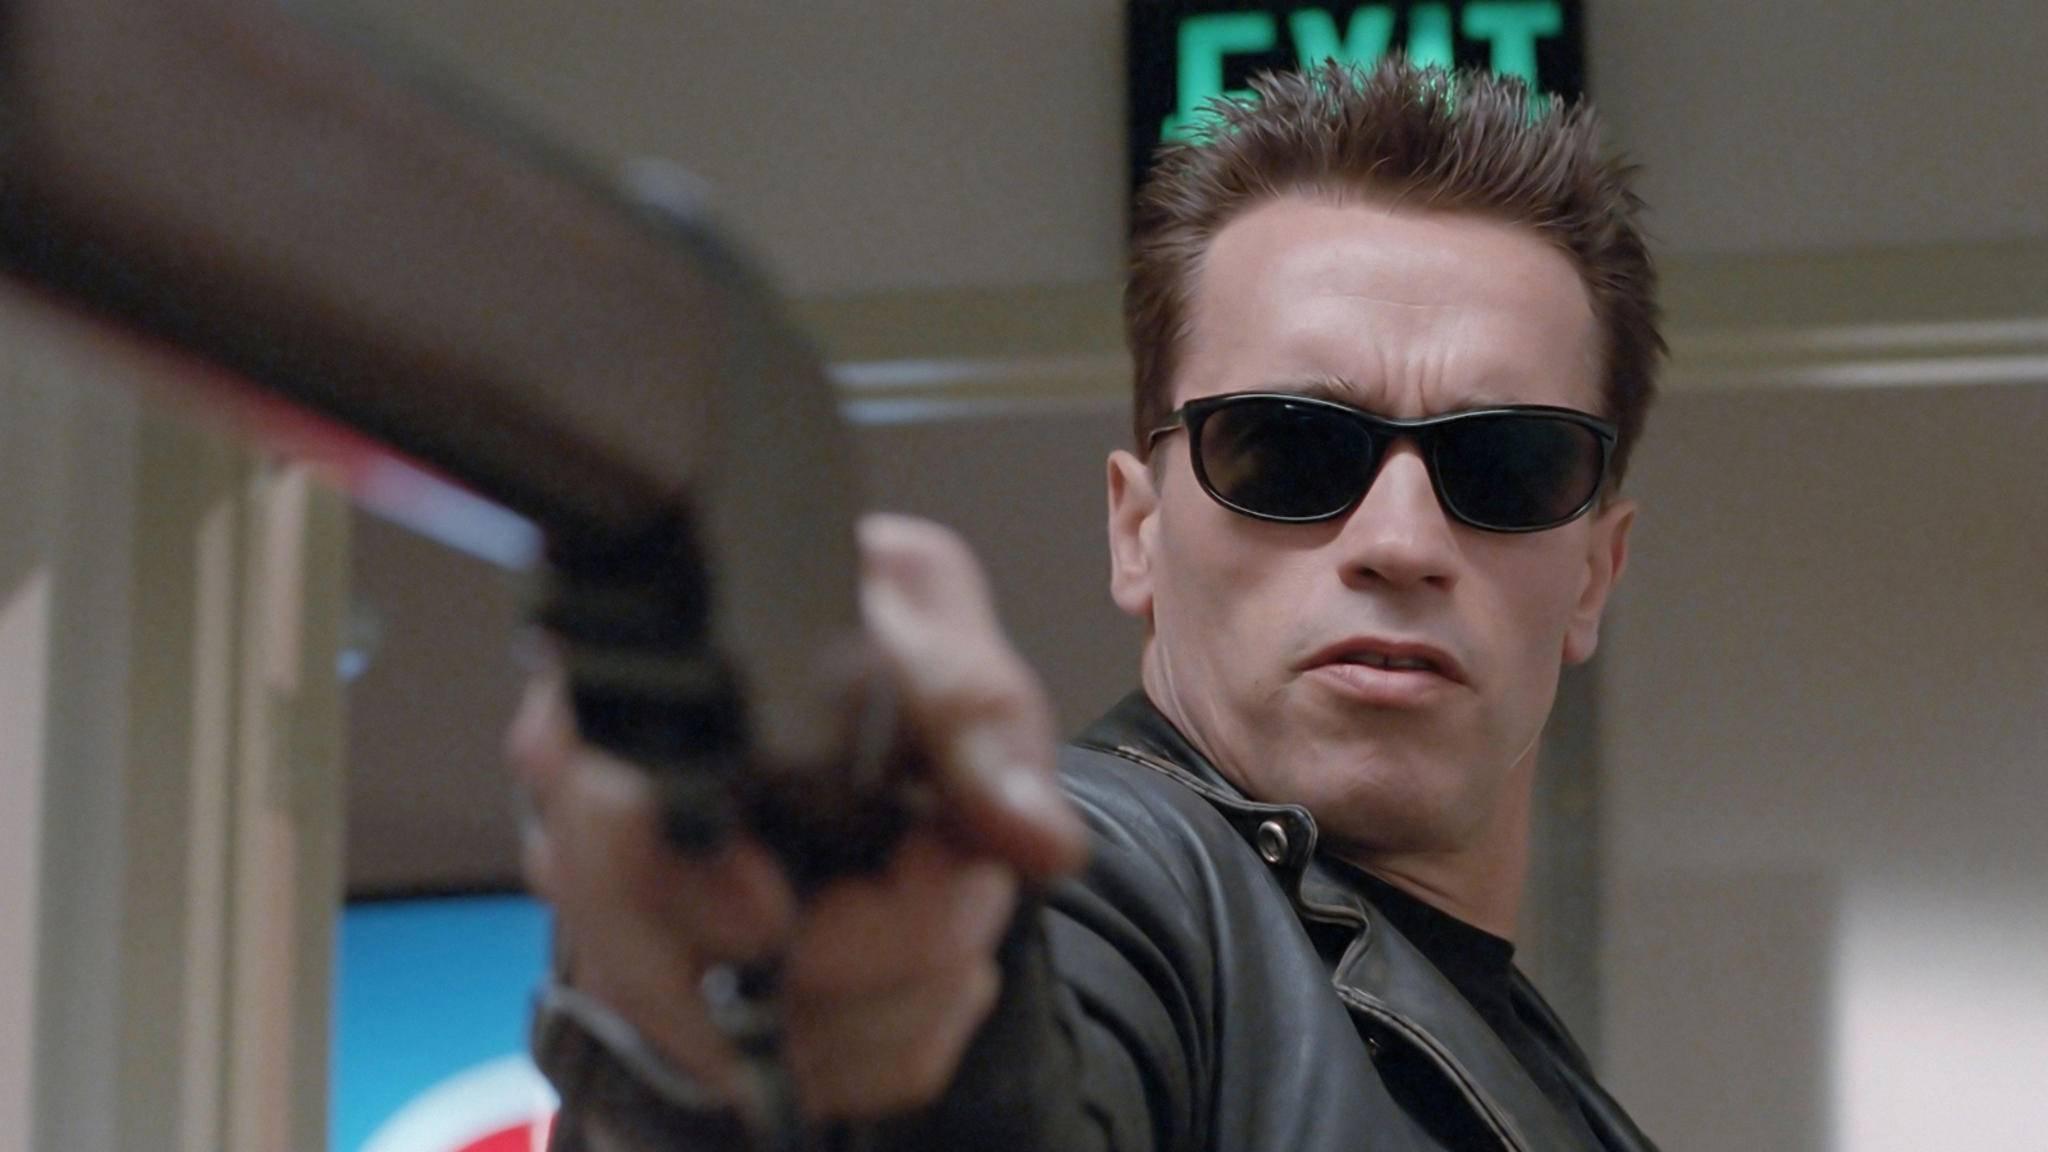 Vom Terminator zum Agenten: Arnold Schwarzenegger erobert bald Netflix!